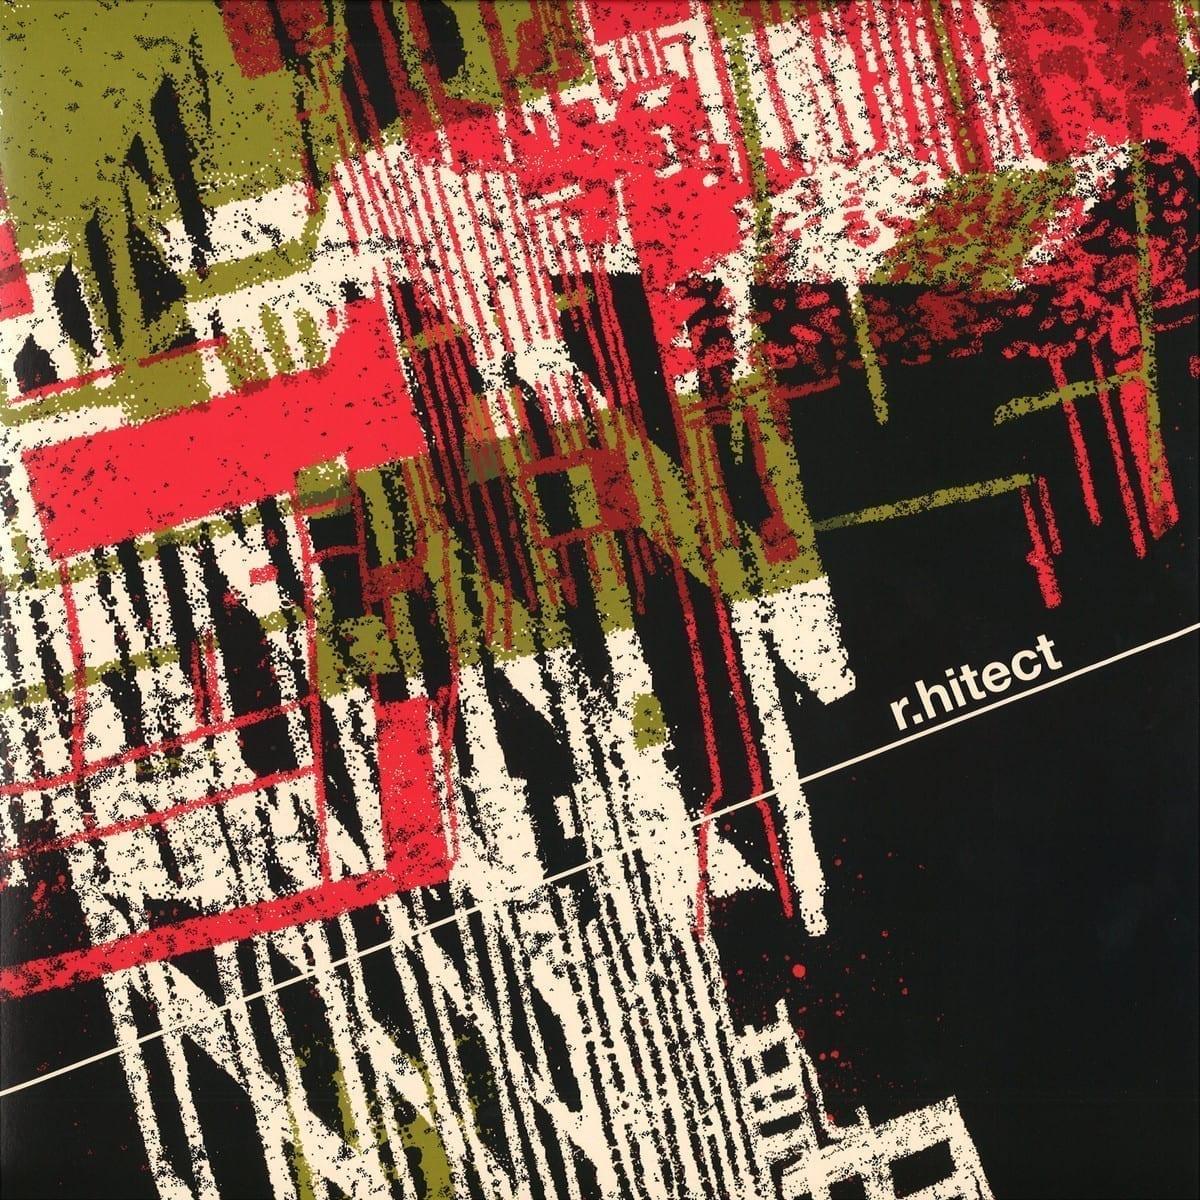 r.hitect - Flamboyant Shell EP [r.hitect] front